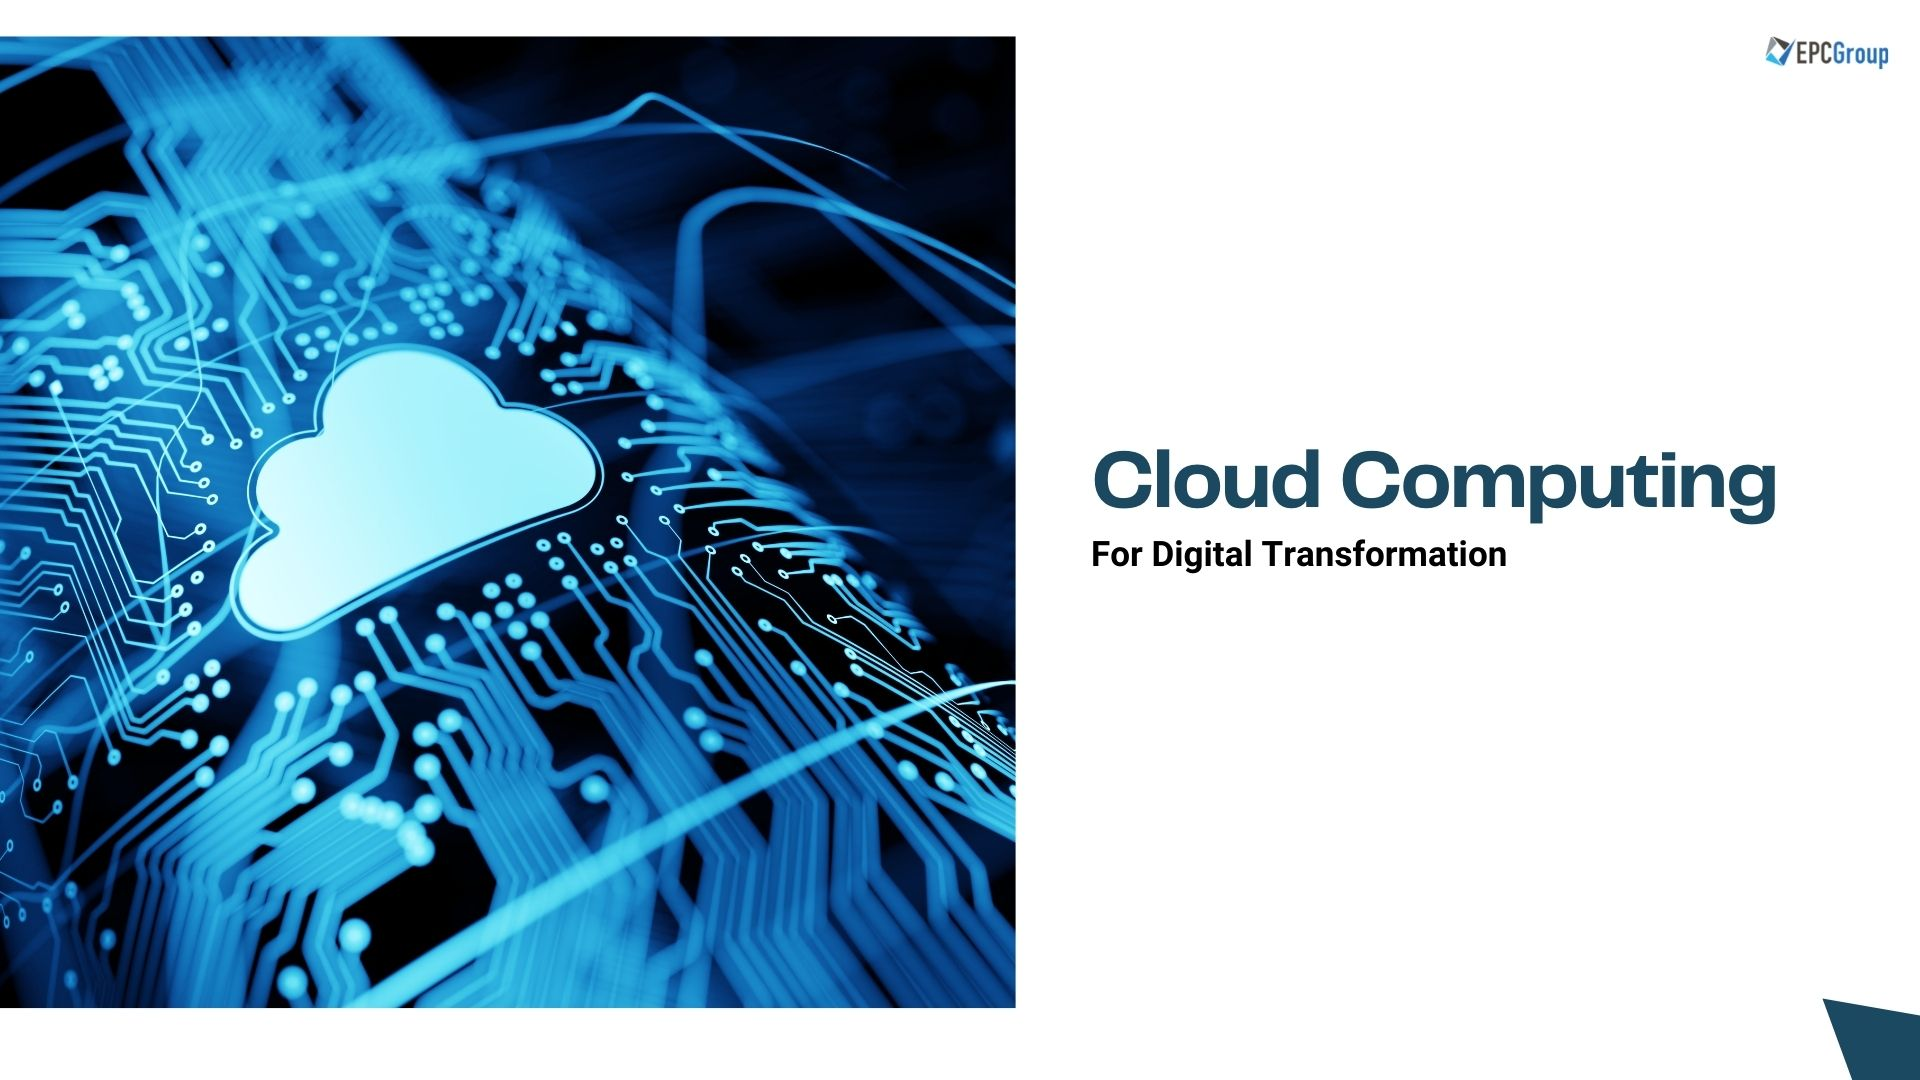 How Cloud Computing Fuels The Digital Transformation? - thumb image